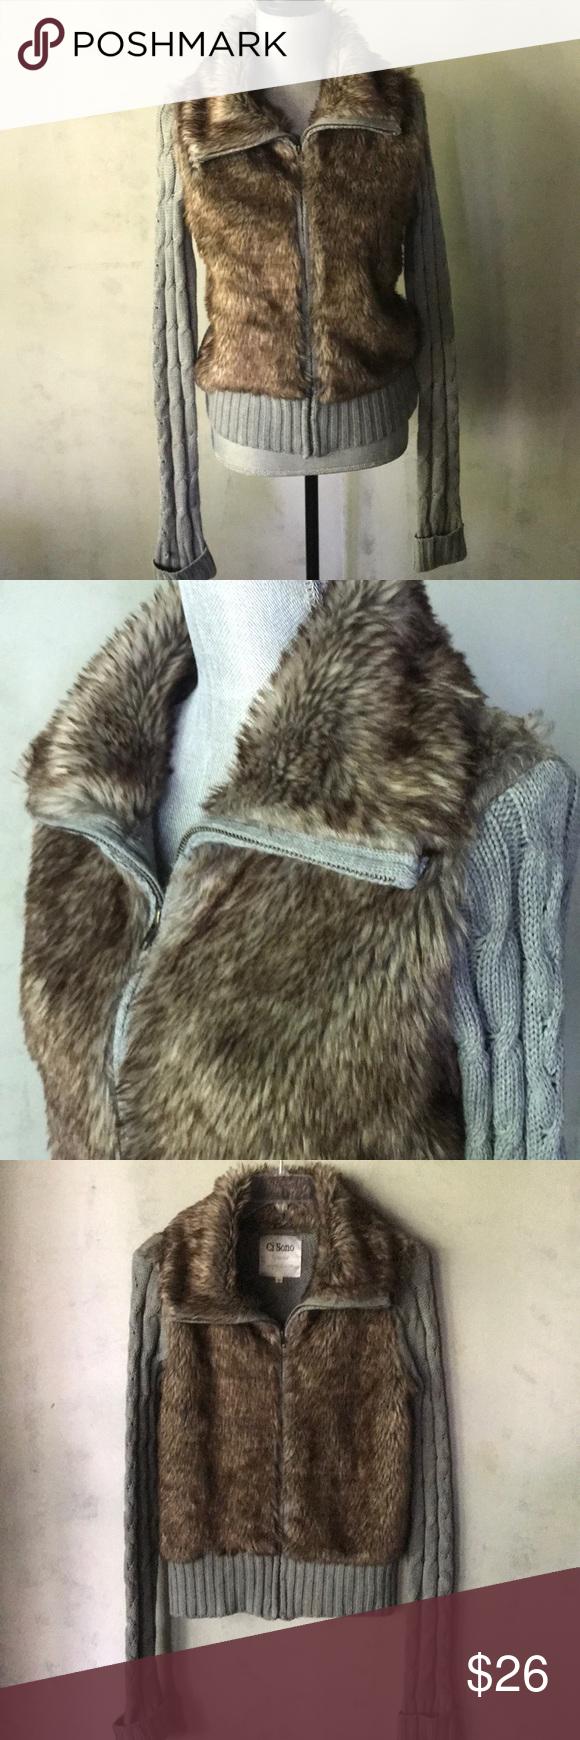 846a7ef4519 Ci Sono Faux Fur Zipped Sweater Super cute & cozy sweater jacket ...